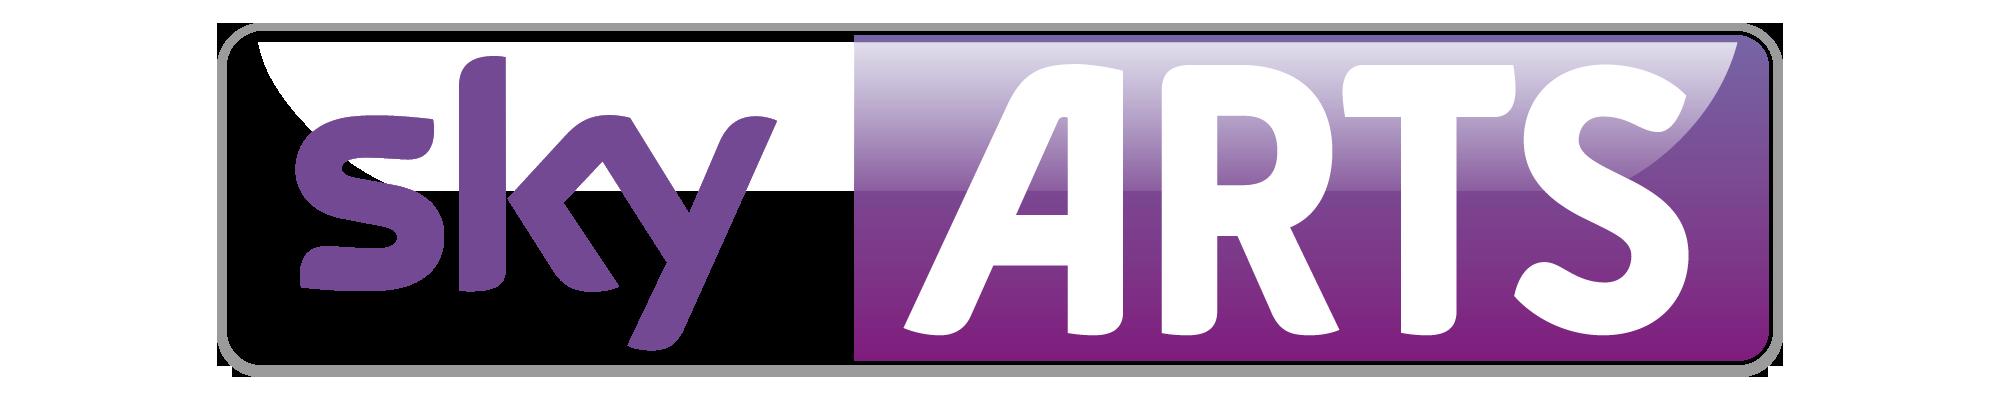 Sky-Arts-logo.png